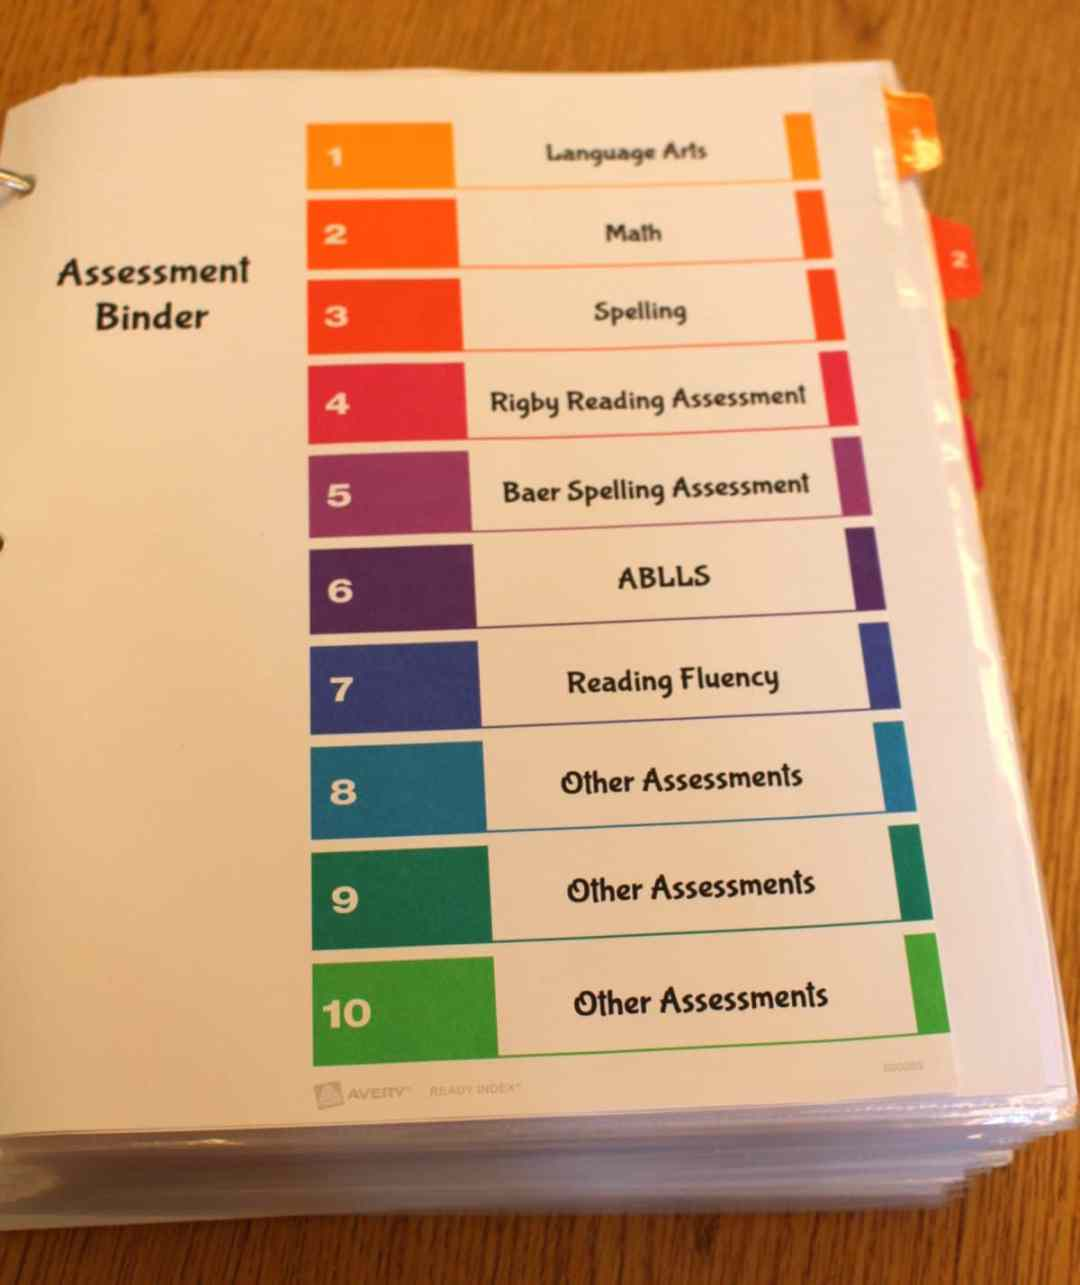 Assessment Binder: Get Organized!